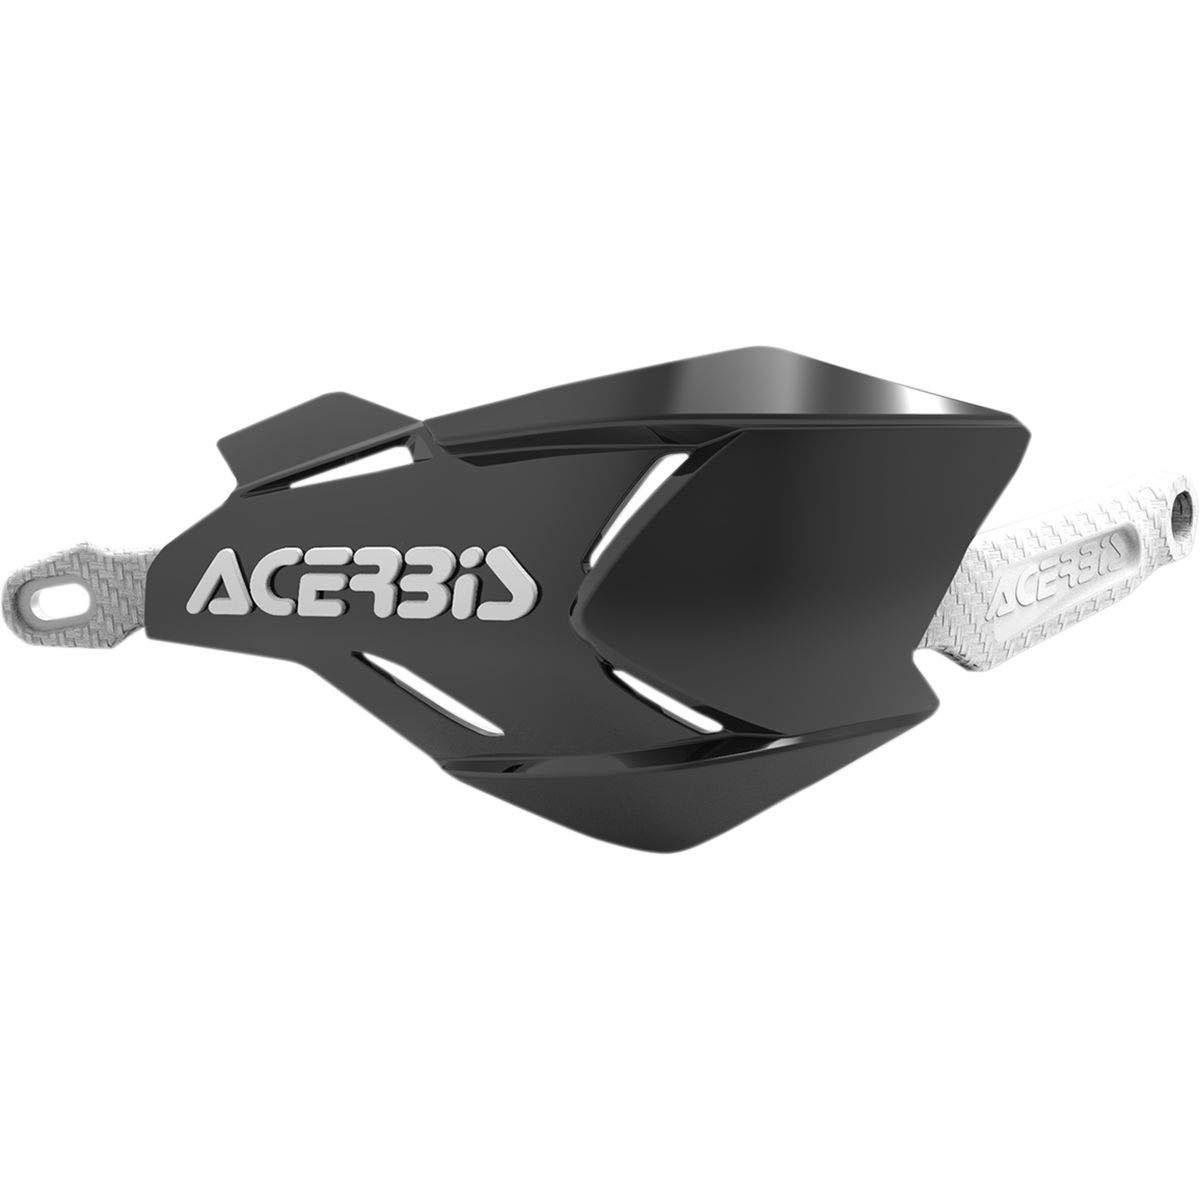 Acerbis Handguards Enduro MX Handprotektoren X-Factory weiss schwarz